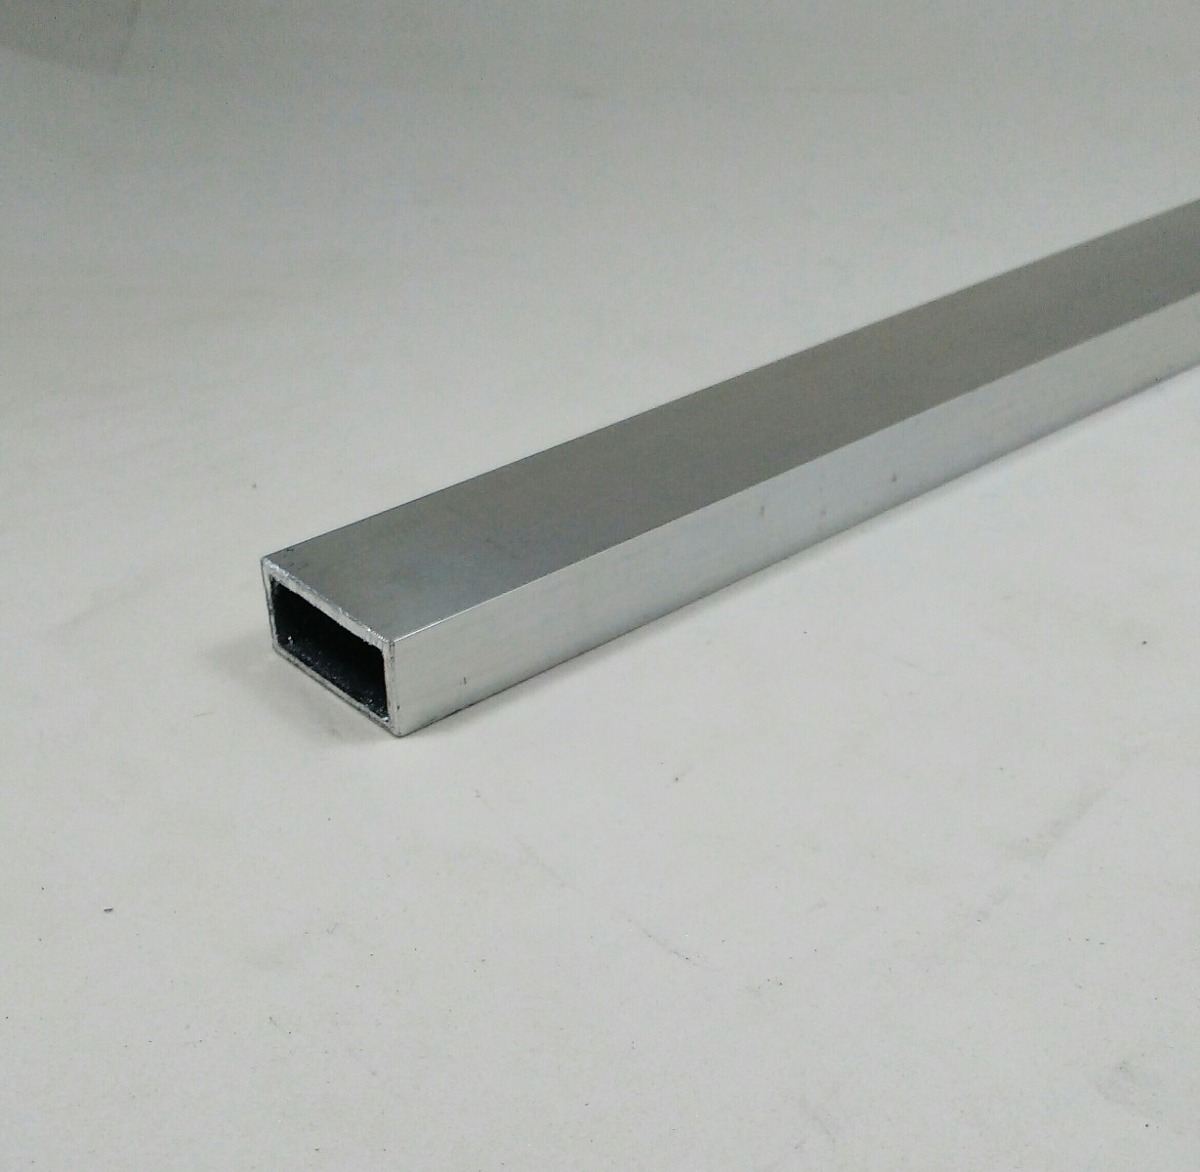 Tubo aluminio retangular 2 54cm x 1 27cm x 1 58mm c 1mt - Tubo de aluminio ...